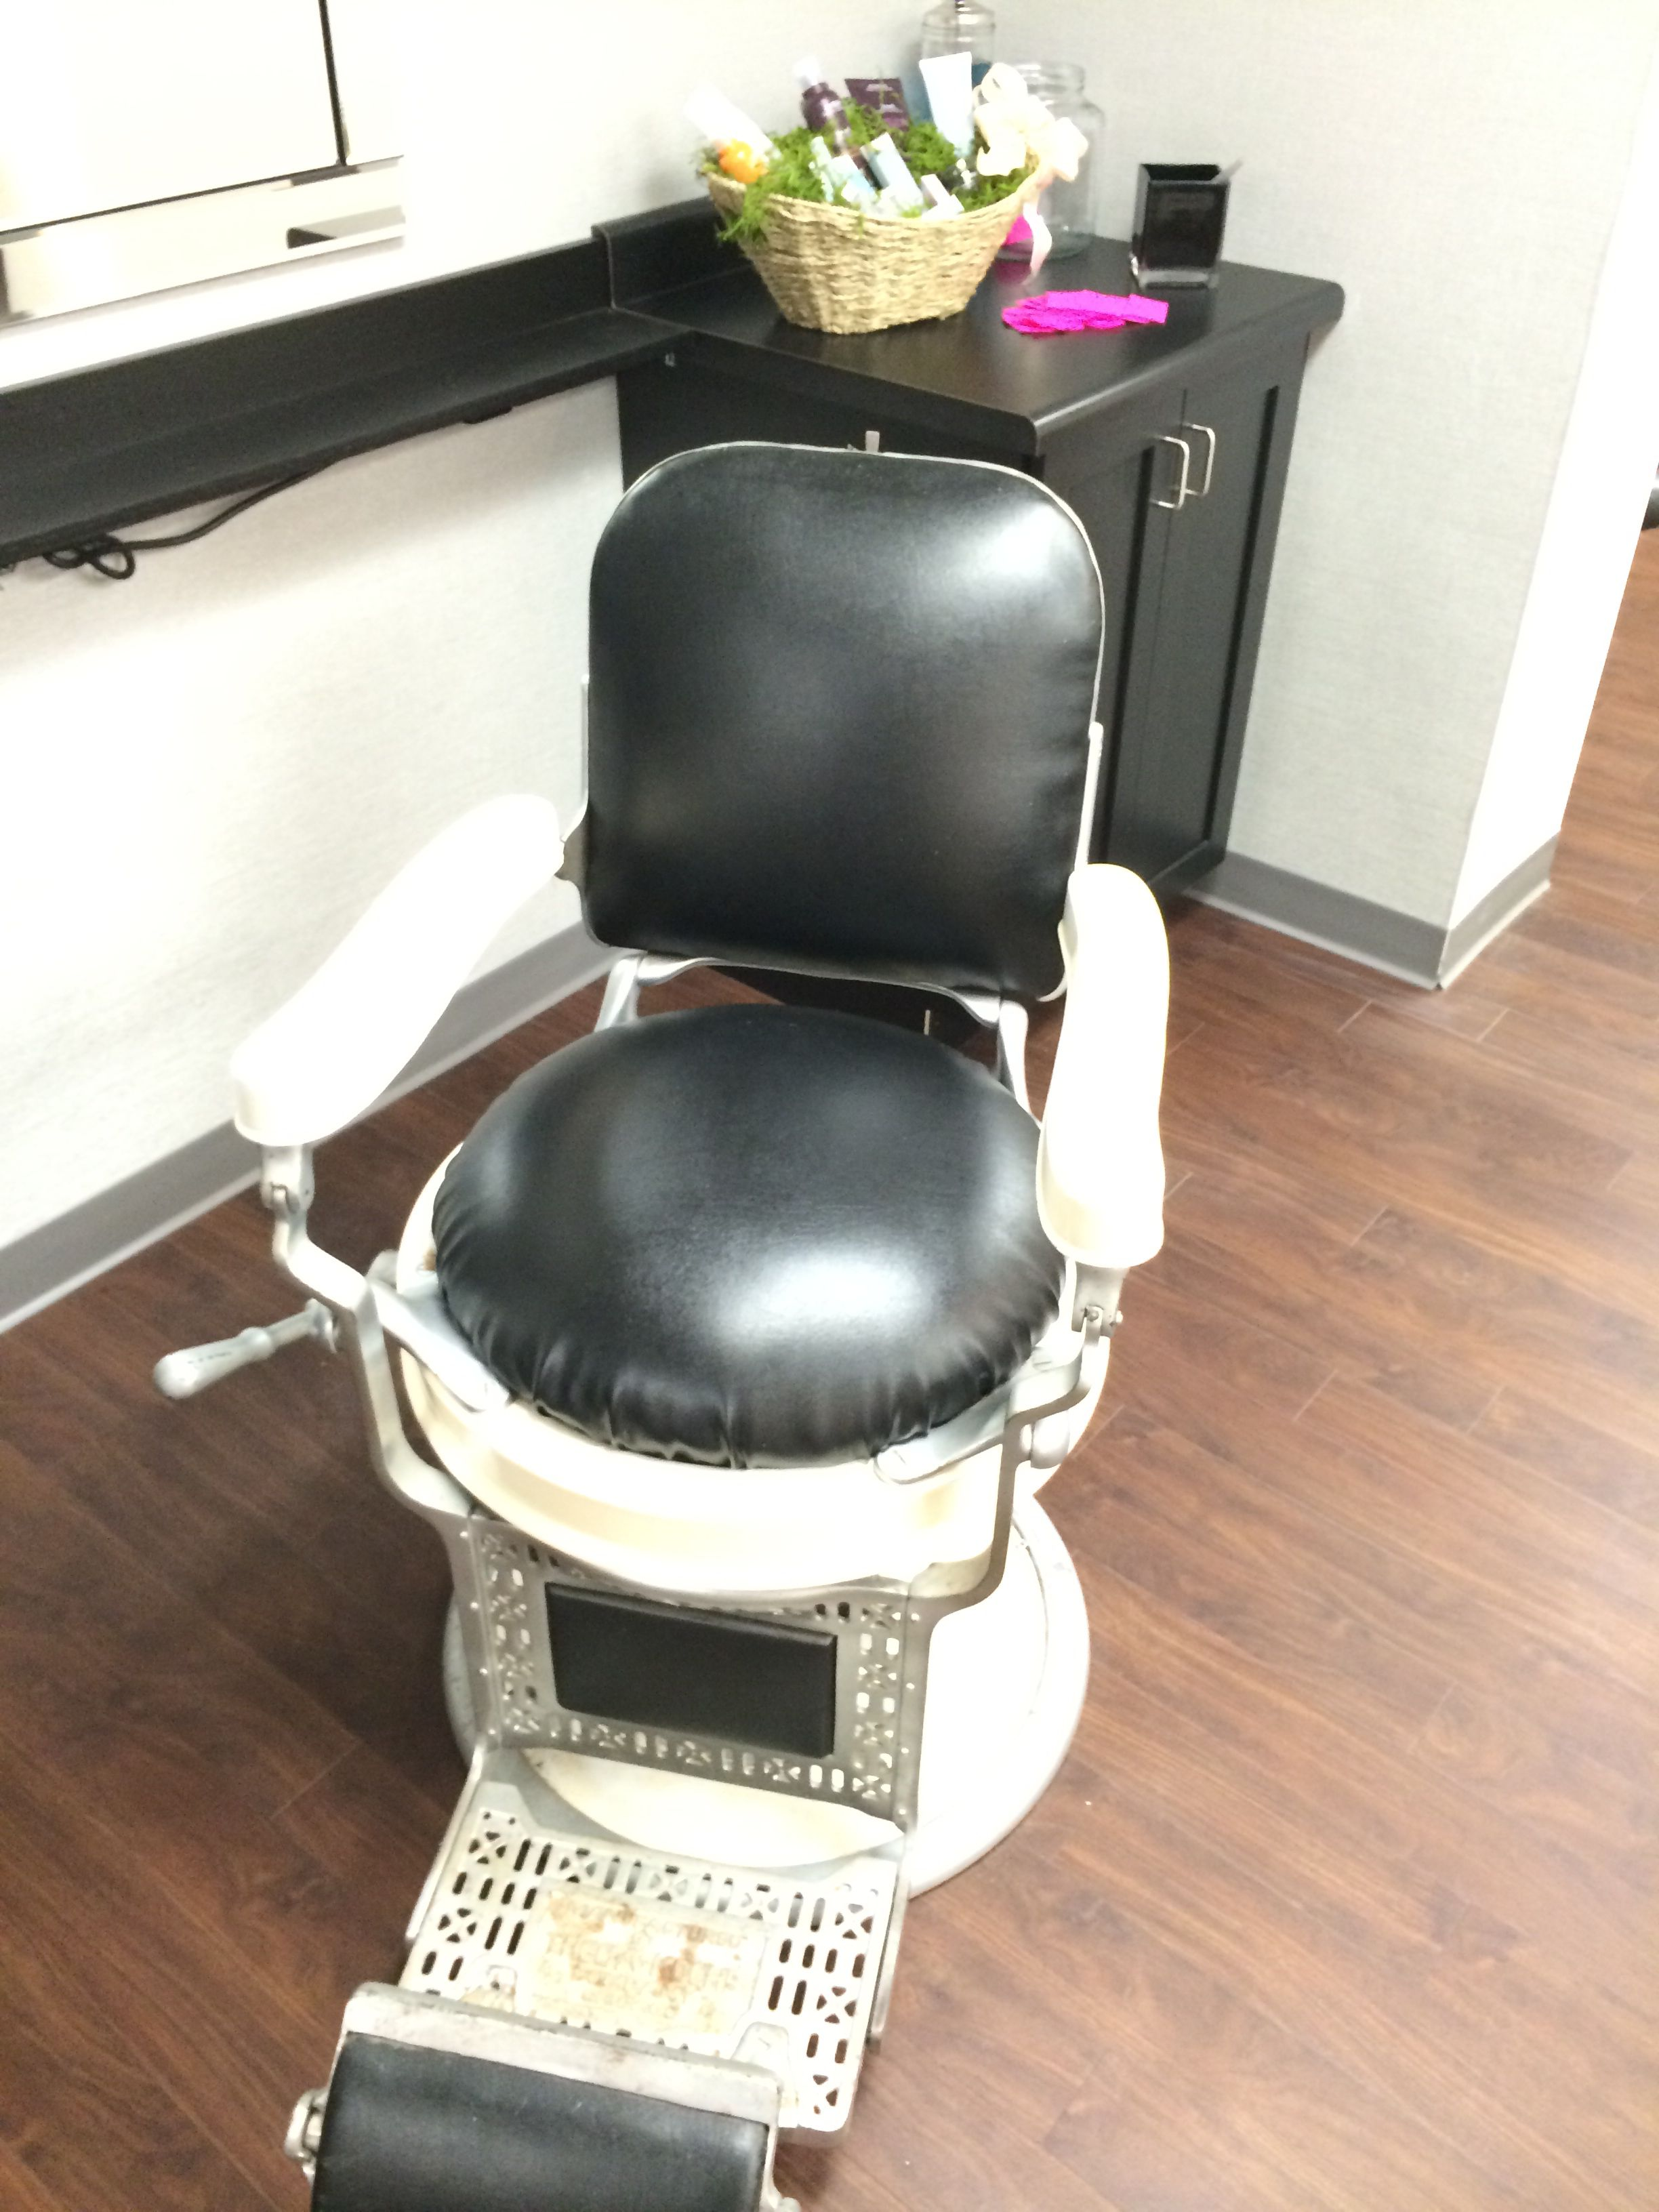 Great barber chair. Bee hive Fairfield Iowa